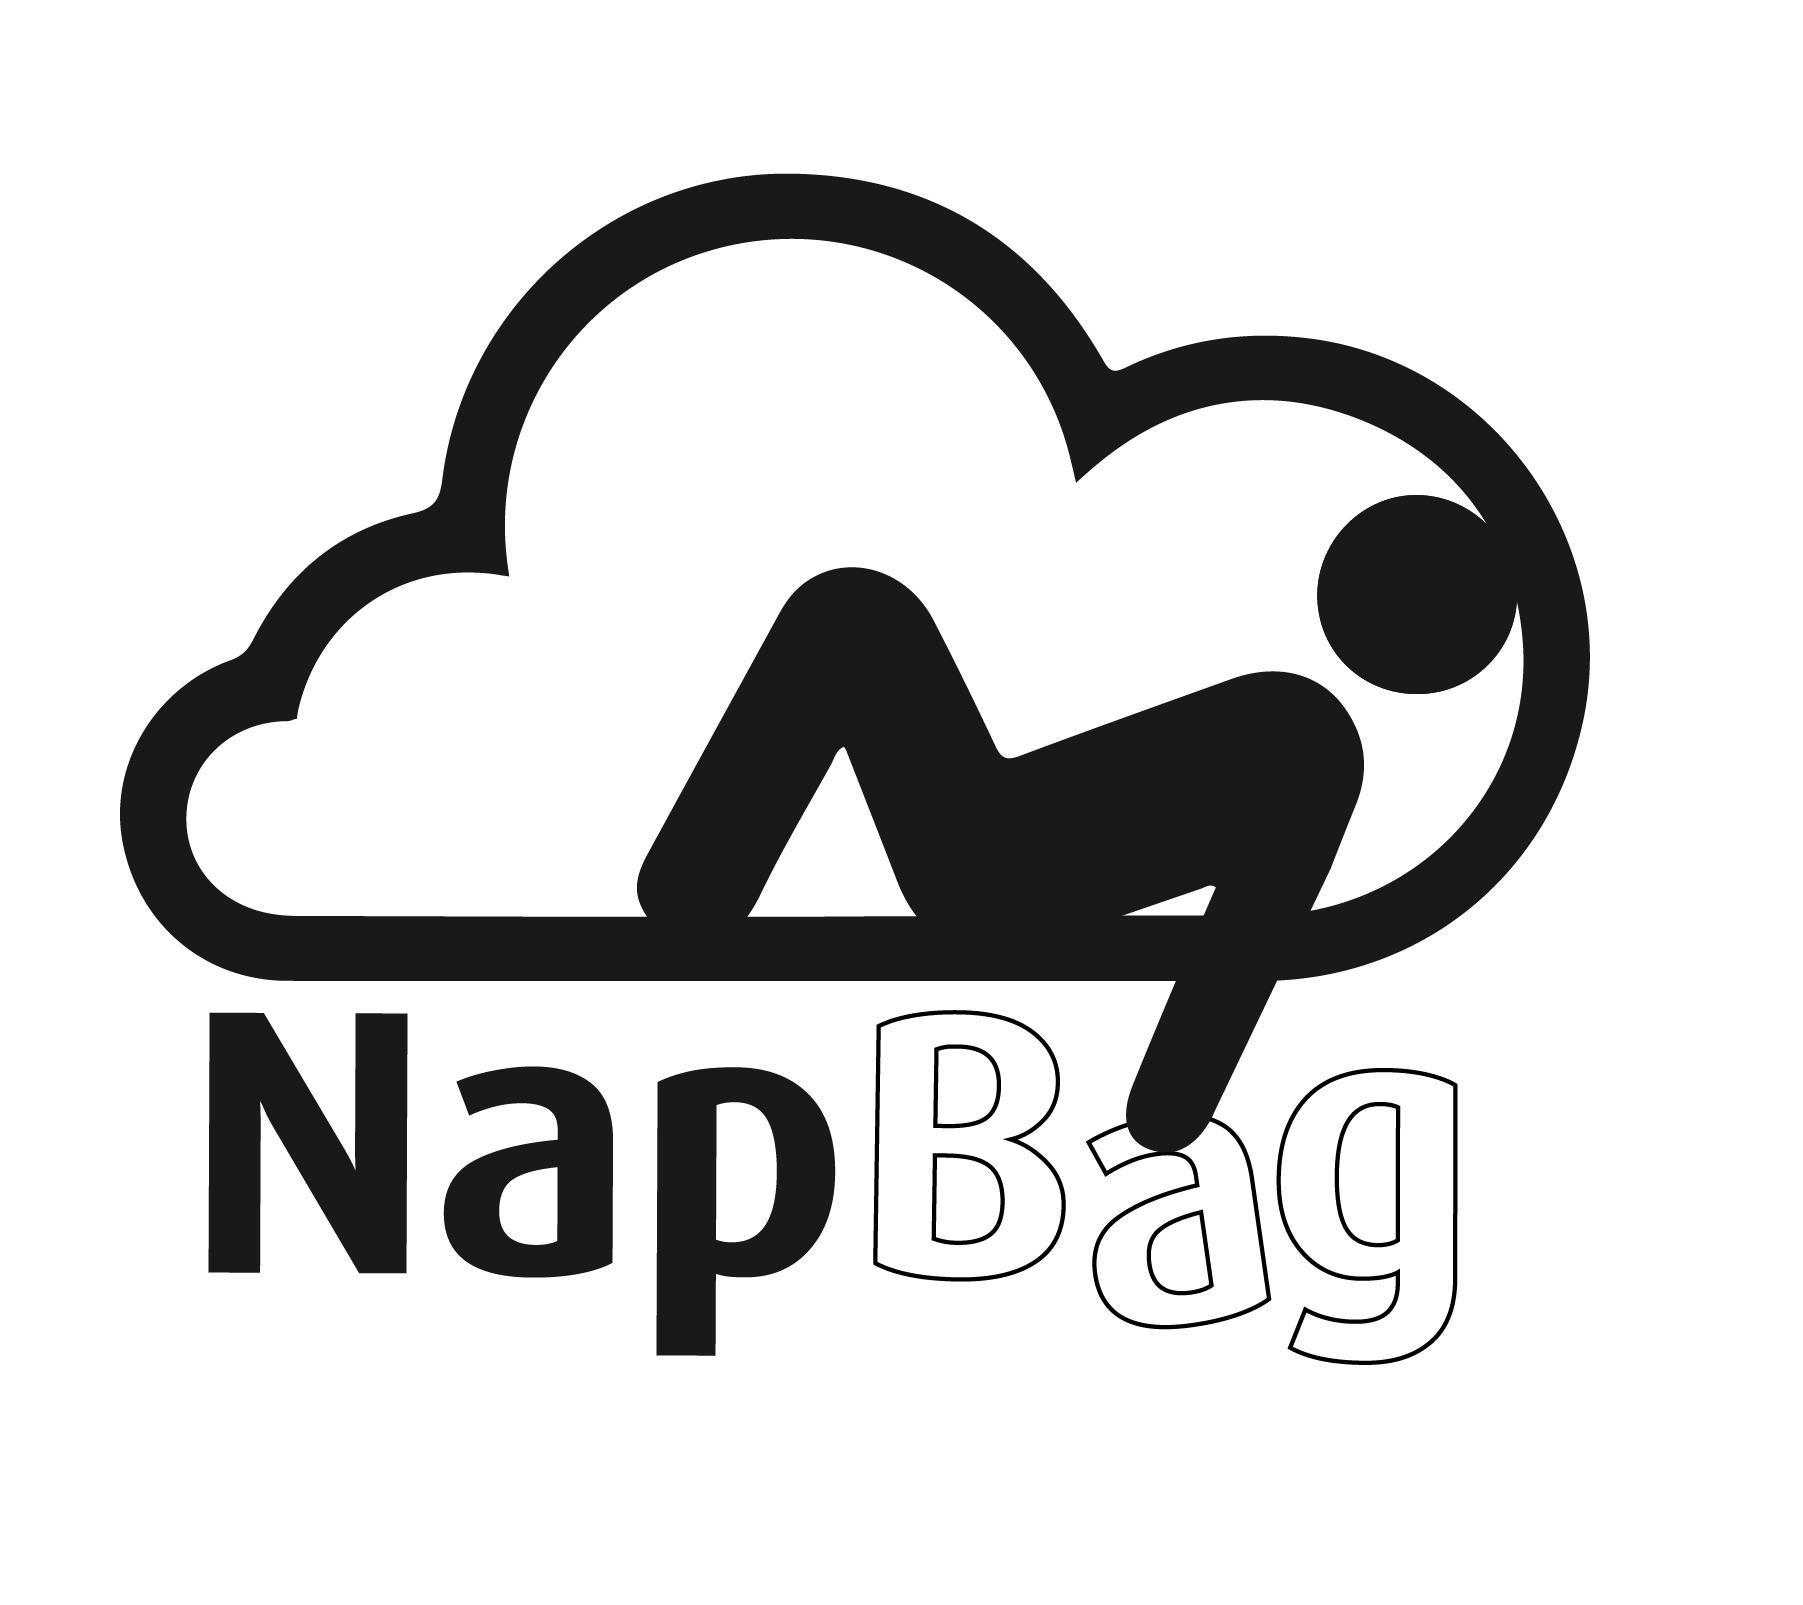 Sill N Inflable Napchair Premium Napbag Paris # Muebles Trinidad Buin